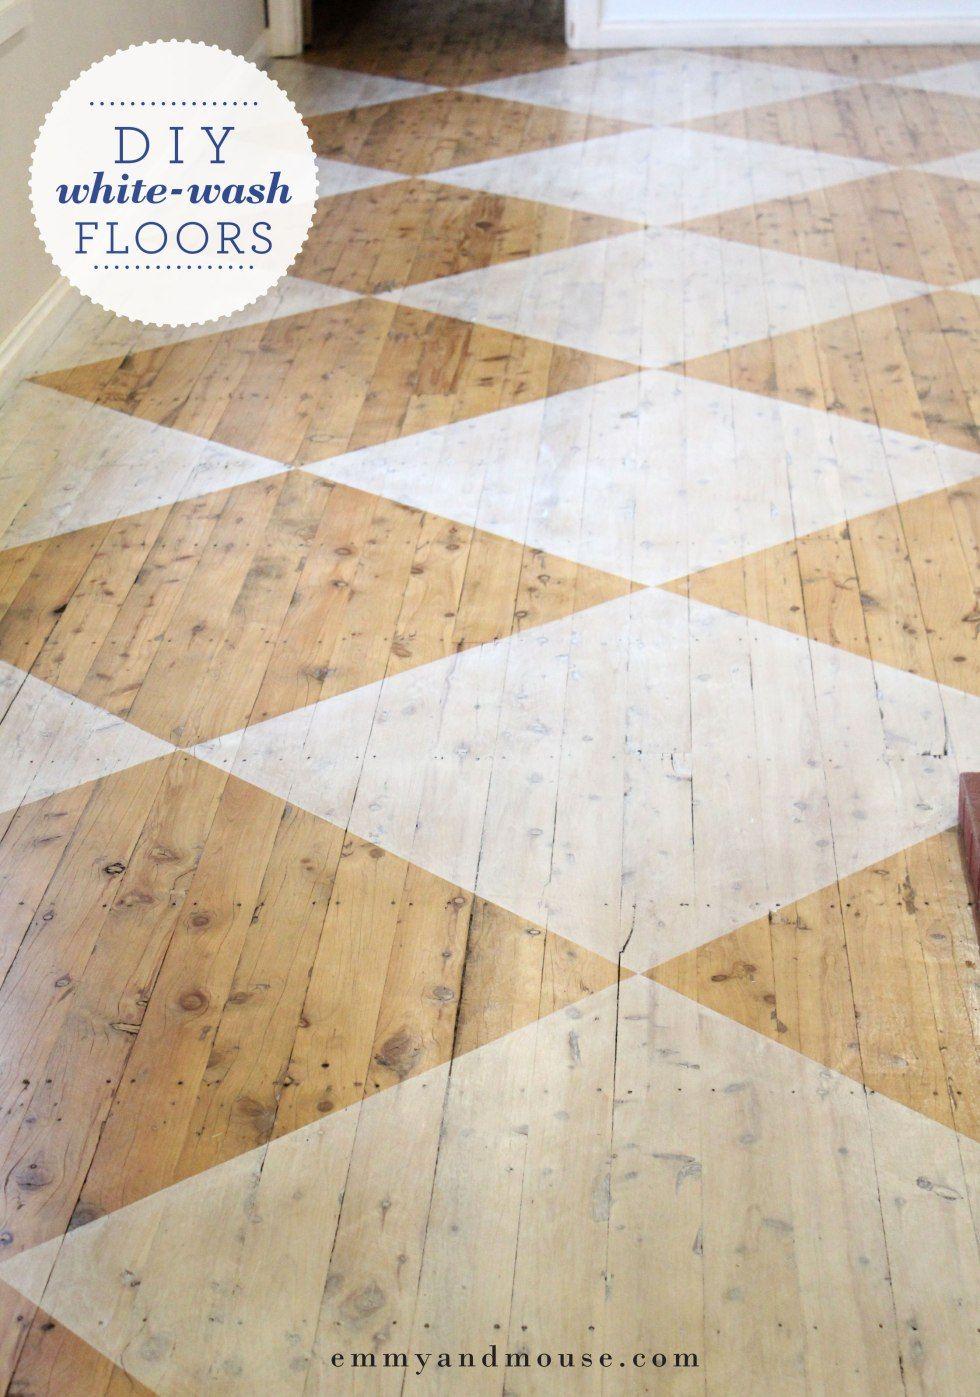 Diy White Washed Patten Floors In 2020 Diy Wood Floors Painted Wood Floors White Wash Wood Floors